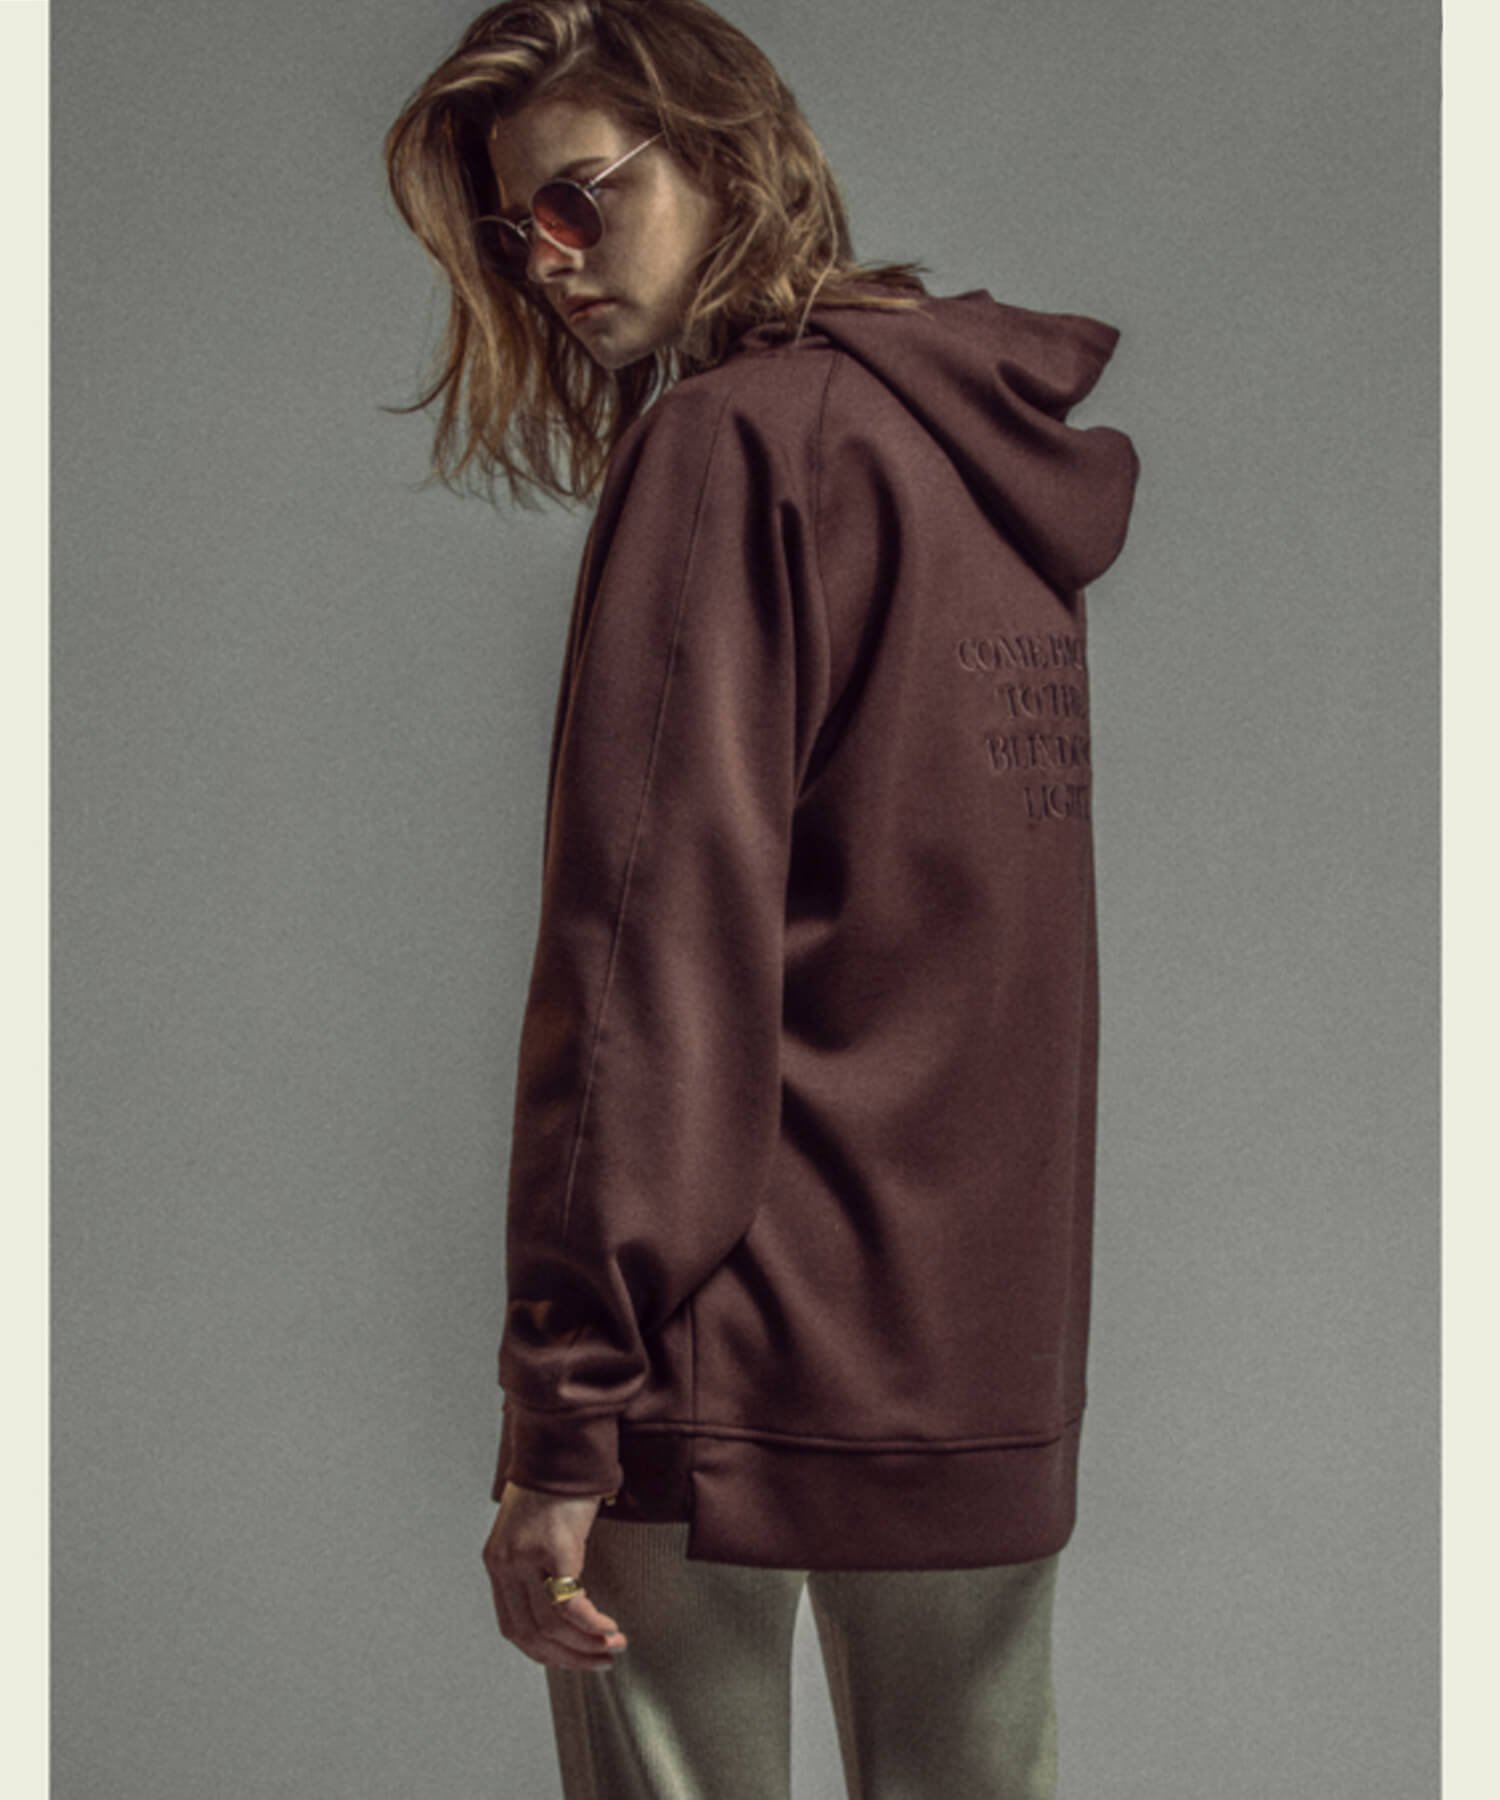 NIL DUE / NIL UN TOKYO / ニル デュエ / ニル アン トーキョー | EMBROIDERY LOGO HOODIE (CHOCOLATE BROWN) 商品画像6